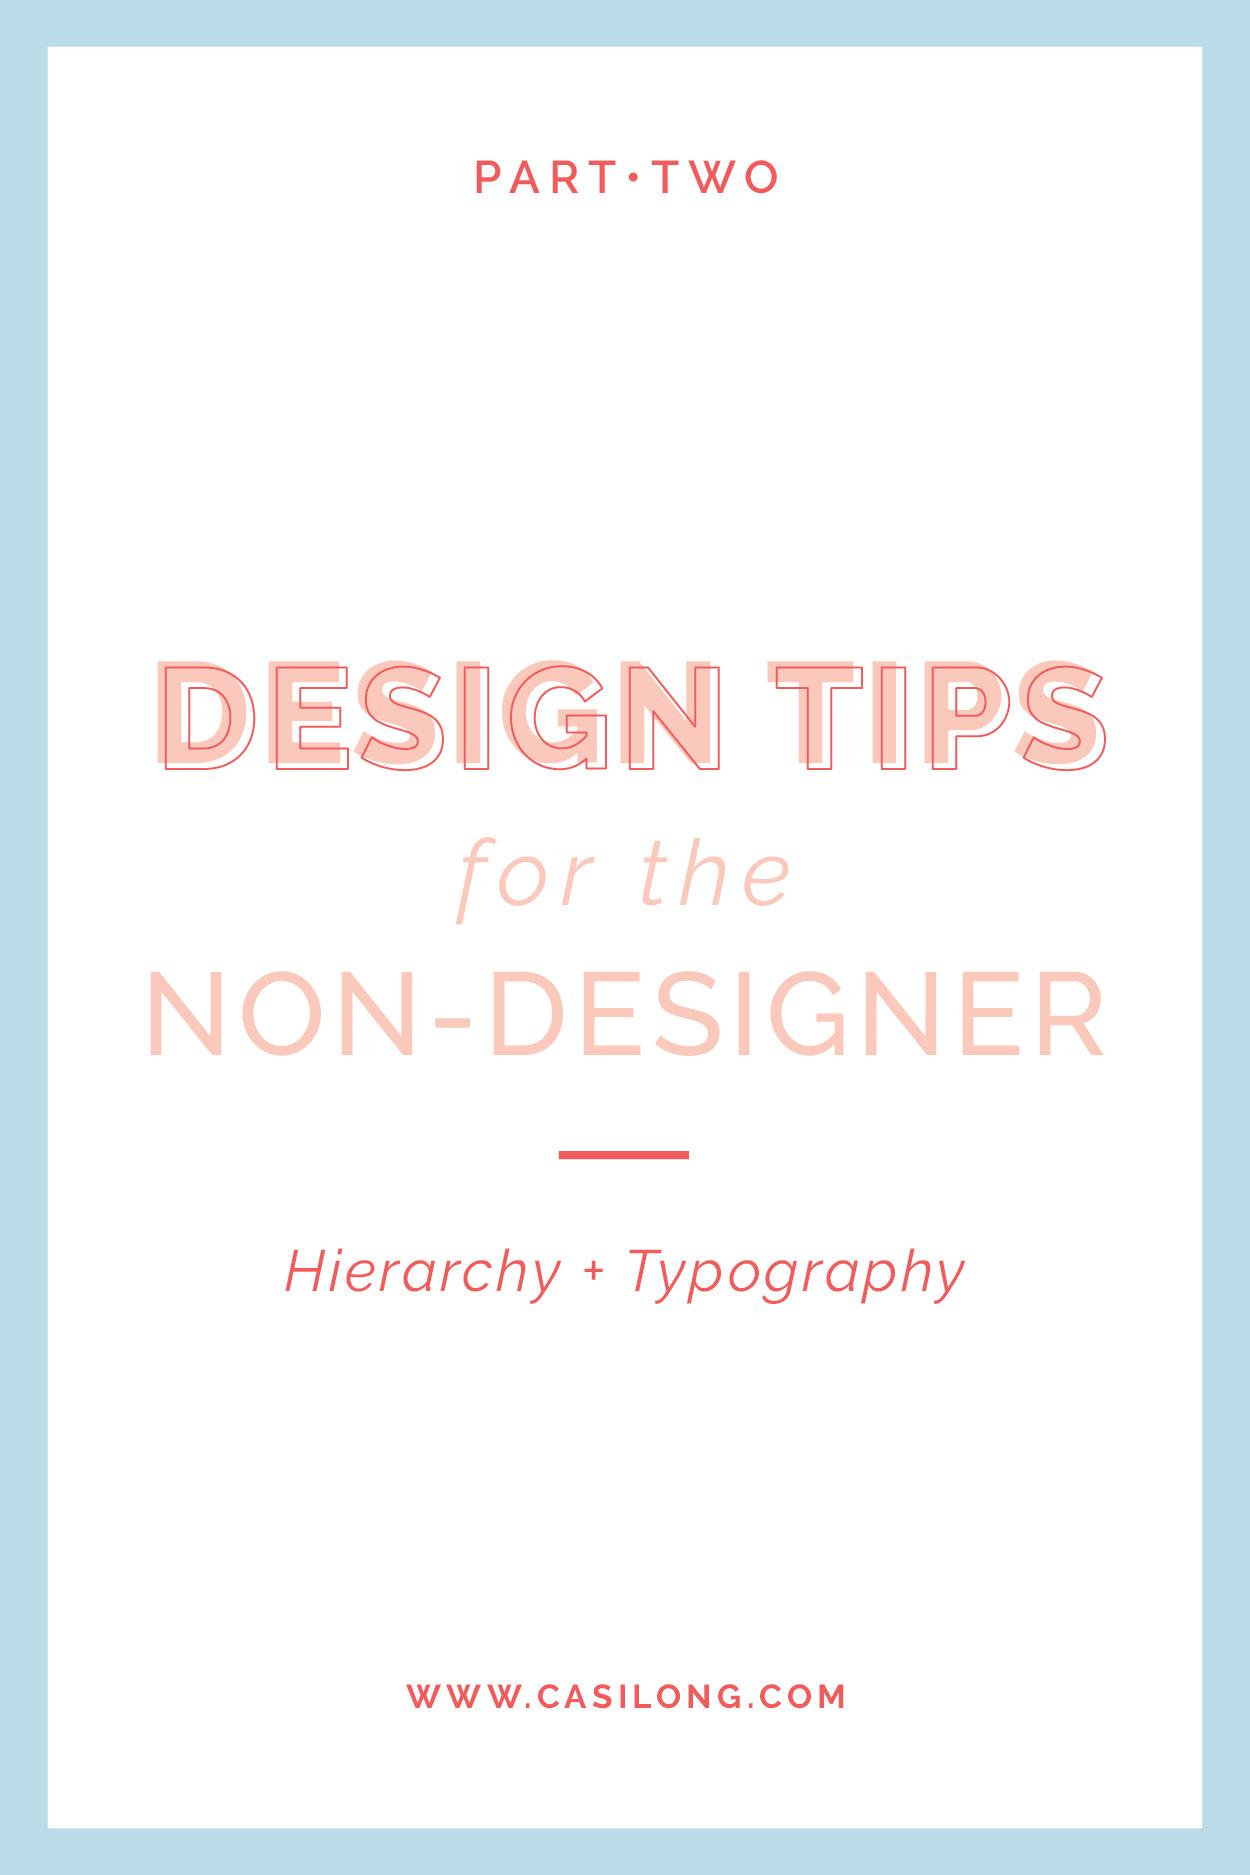 Design Tips for the Non-Designer Part Two | Hierarchy + Typography | casilong.com/blog | #casilongdesign #fearlesspursuit